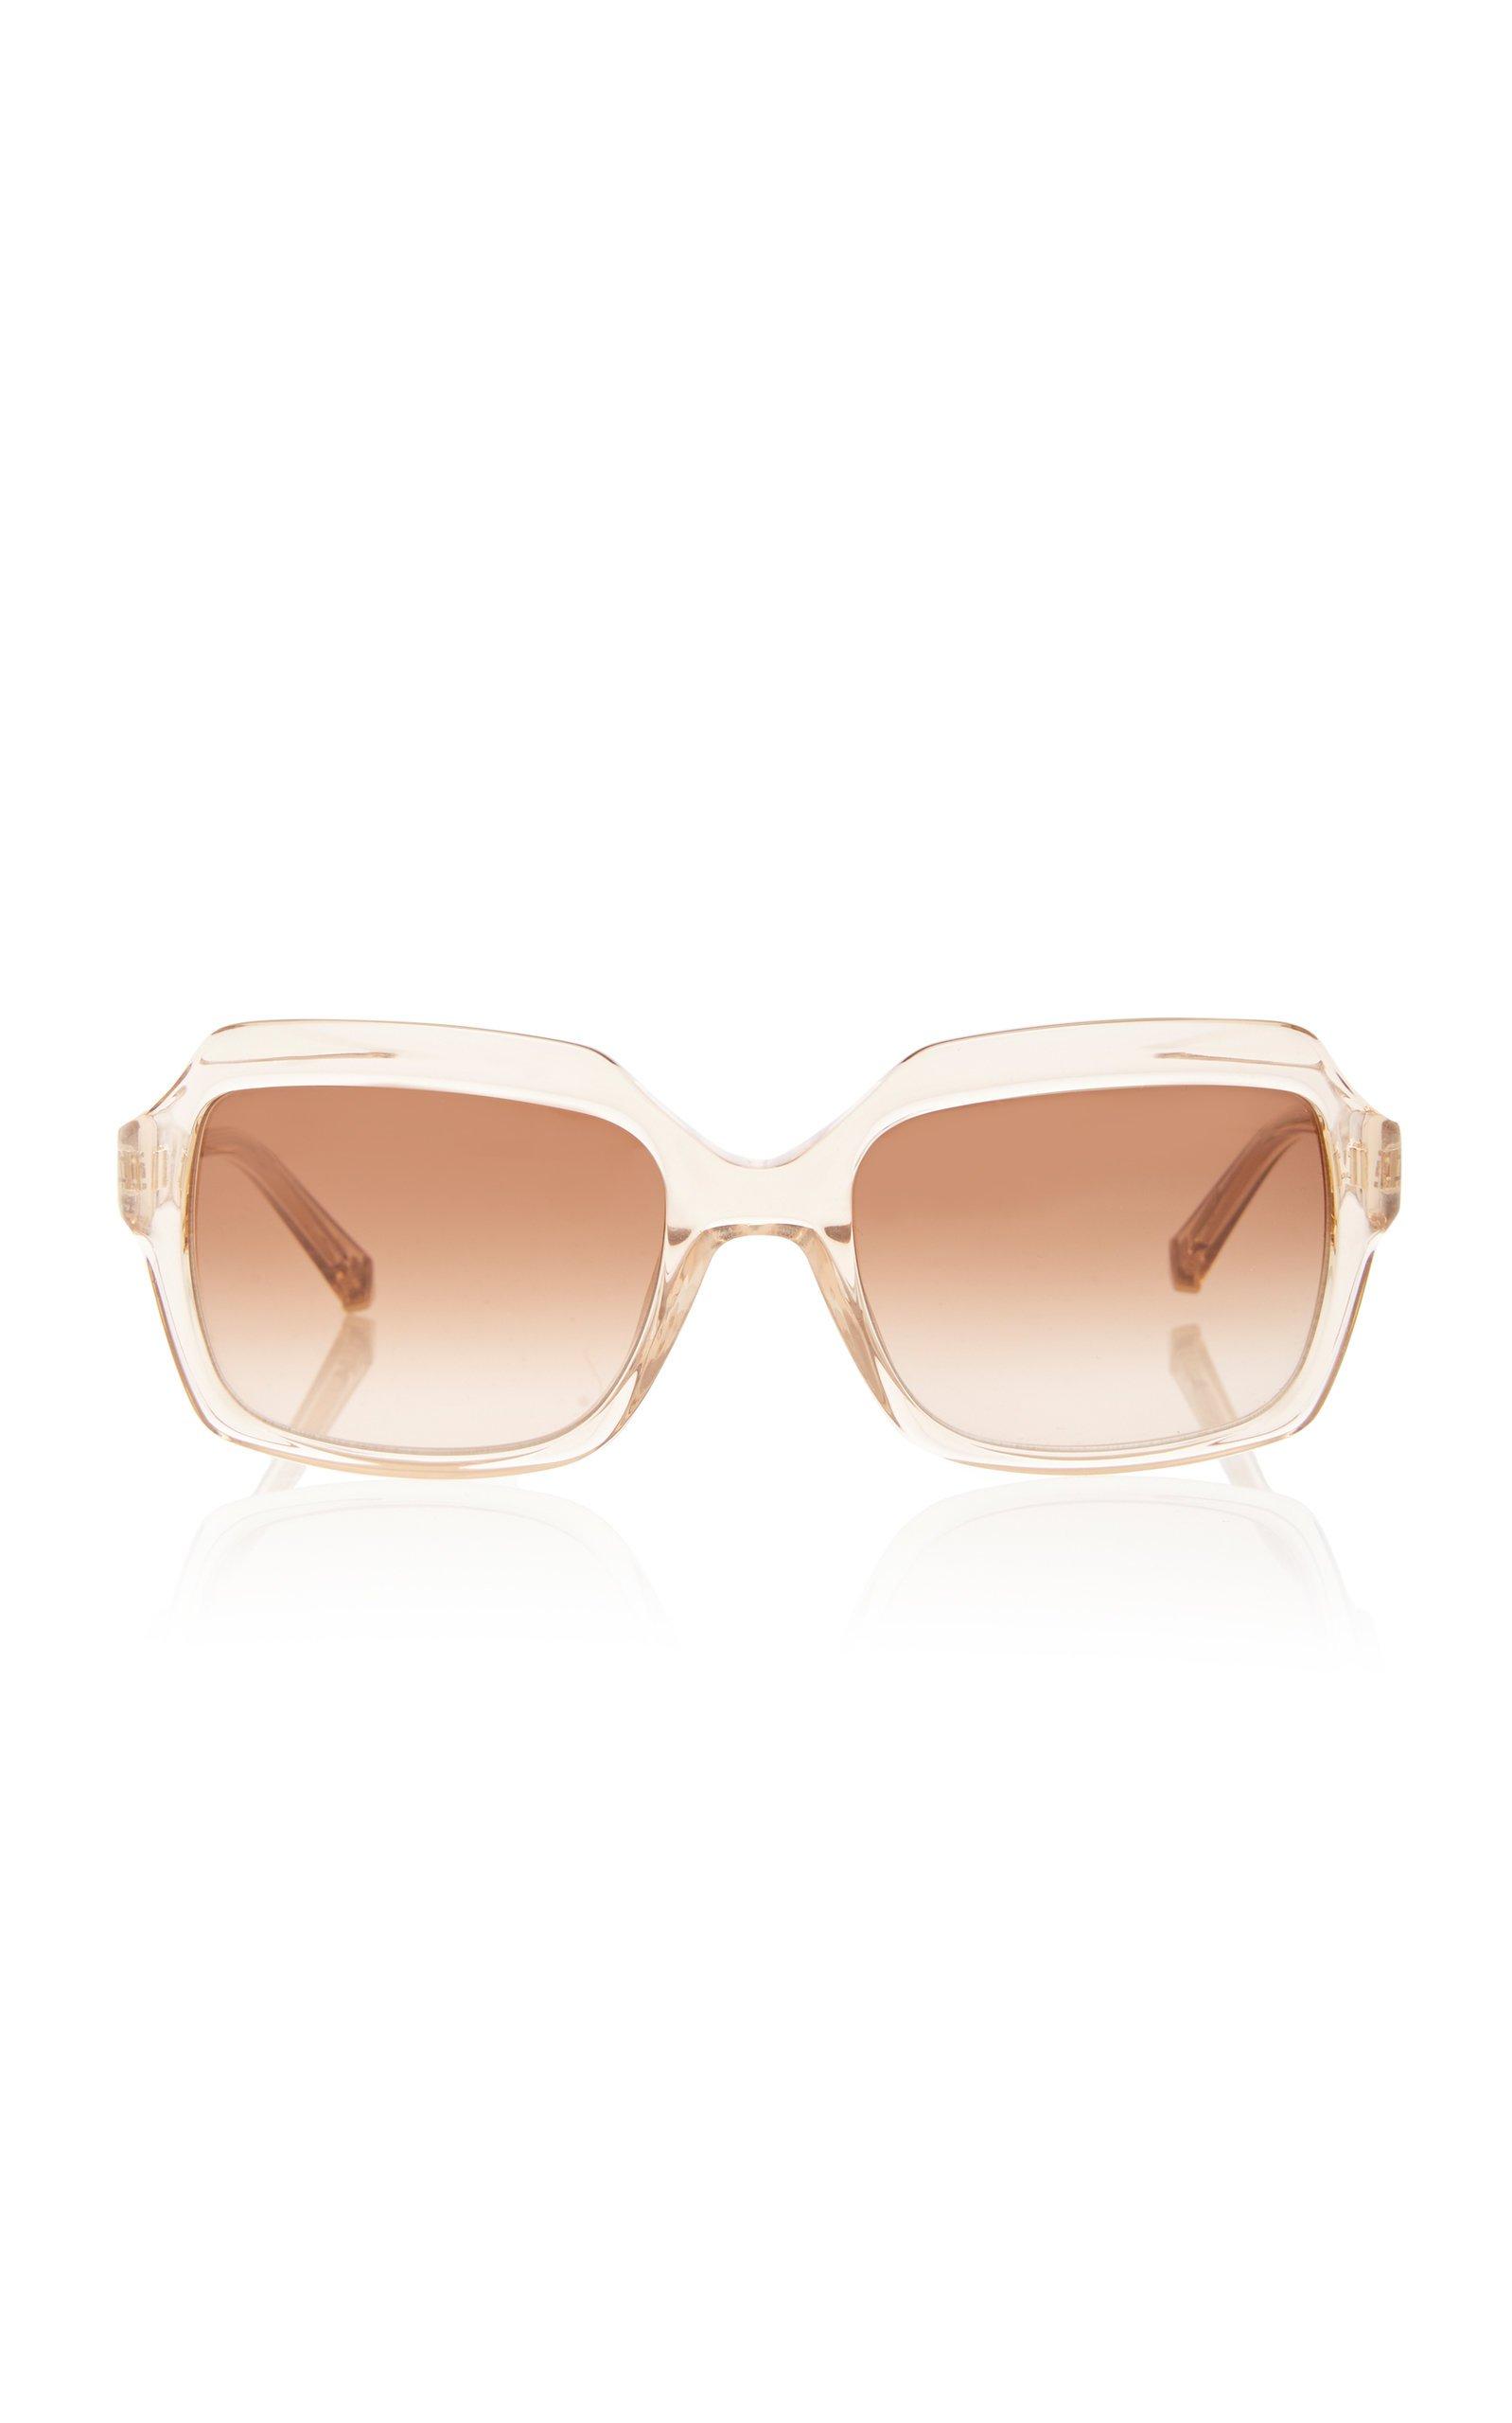 Kate Young Toni Square-Frame Acetate Sunglasses